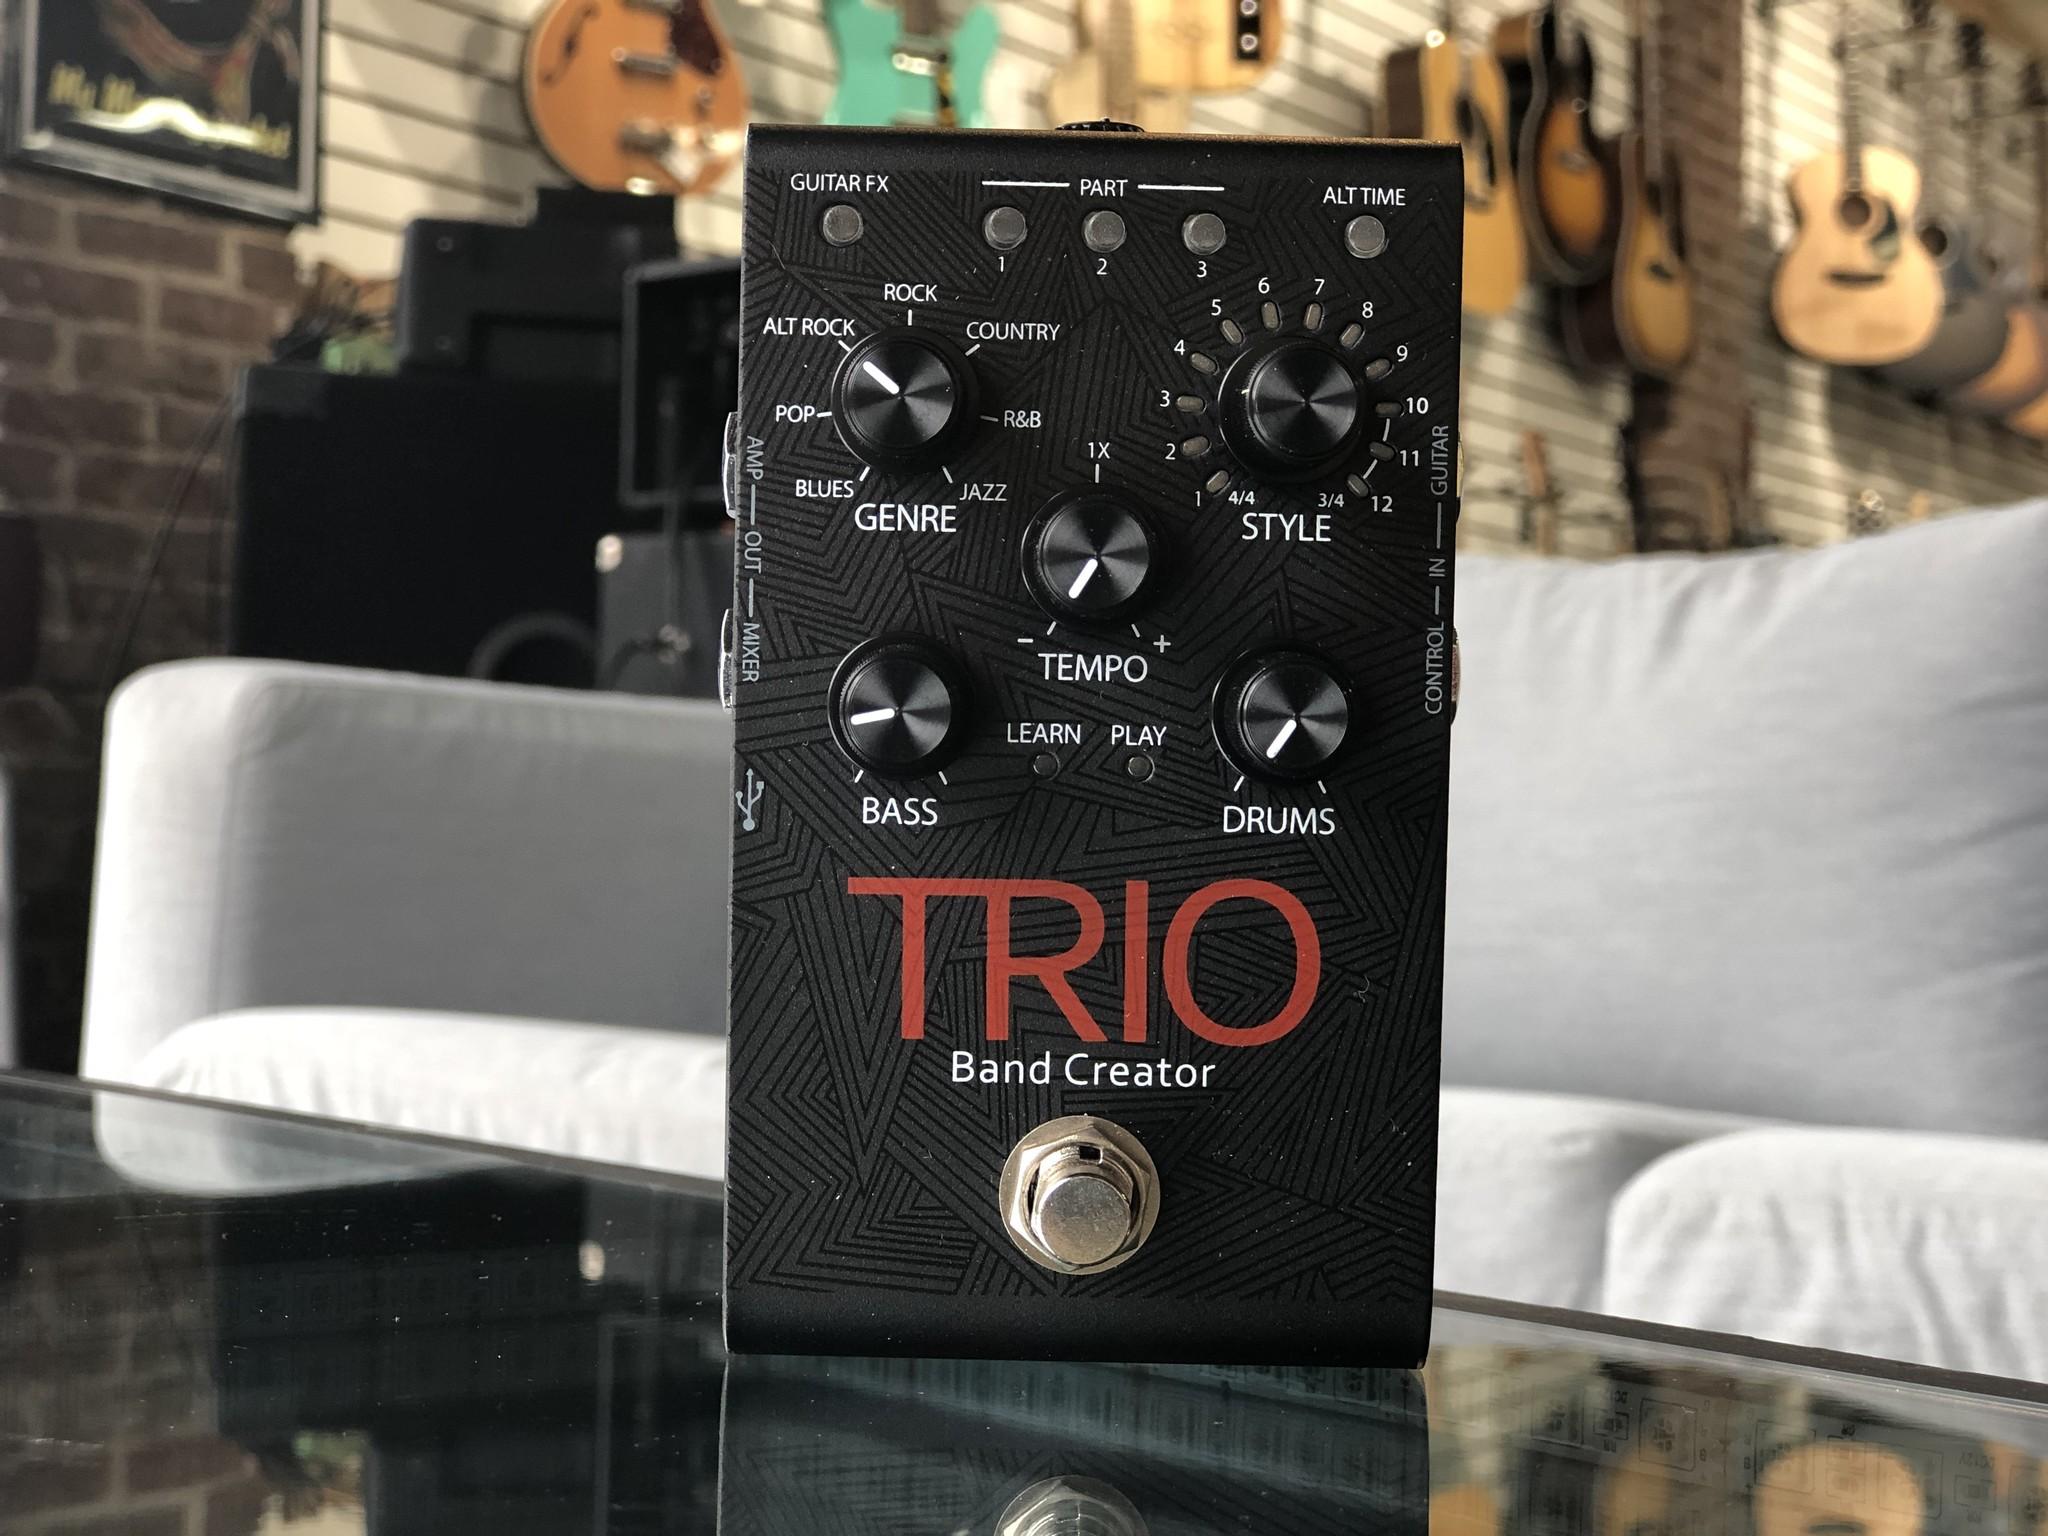 Digitech Trio Band Creator-1